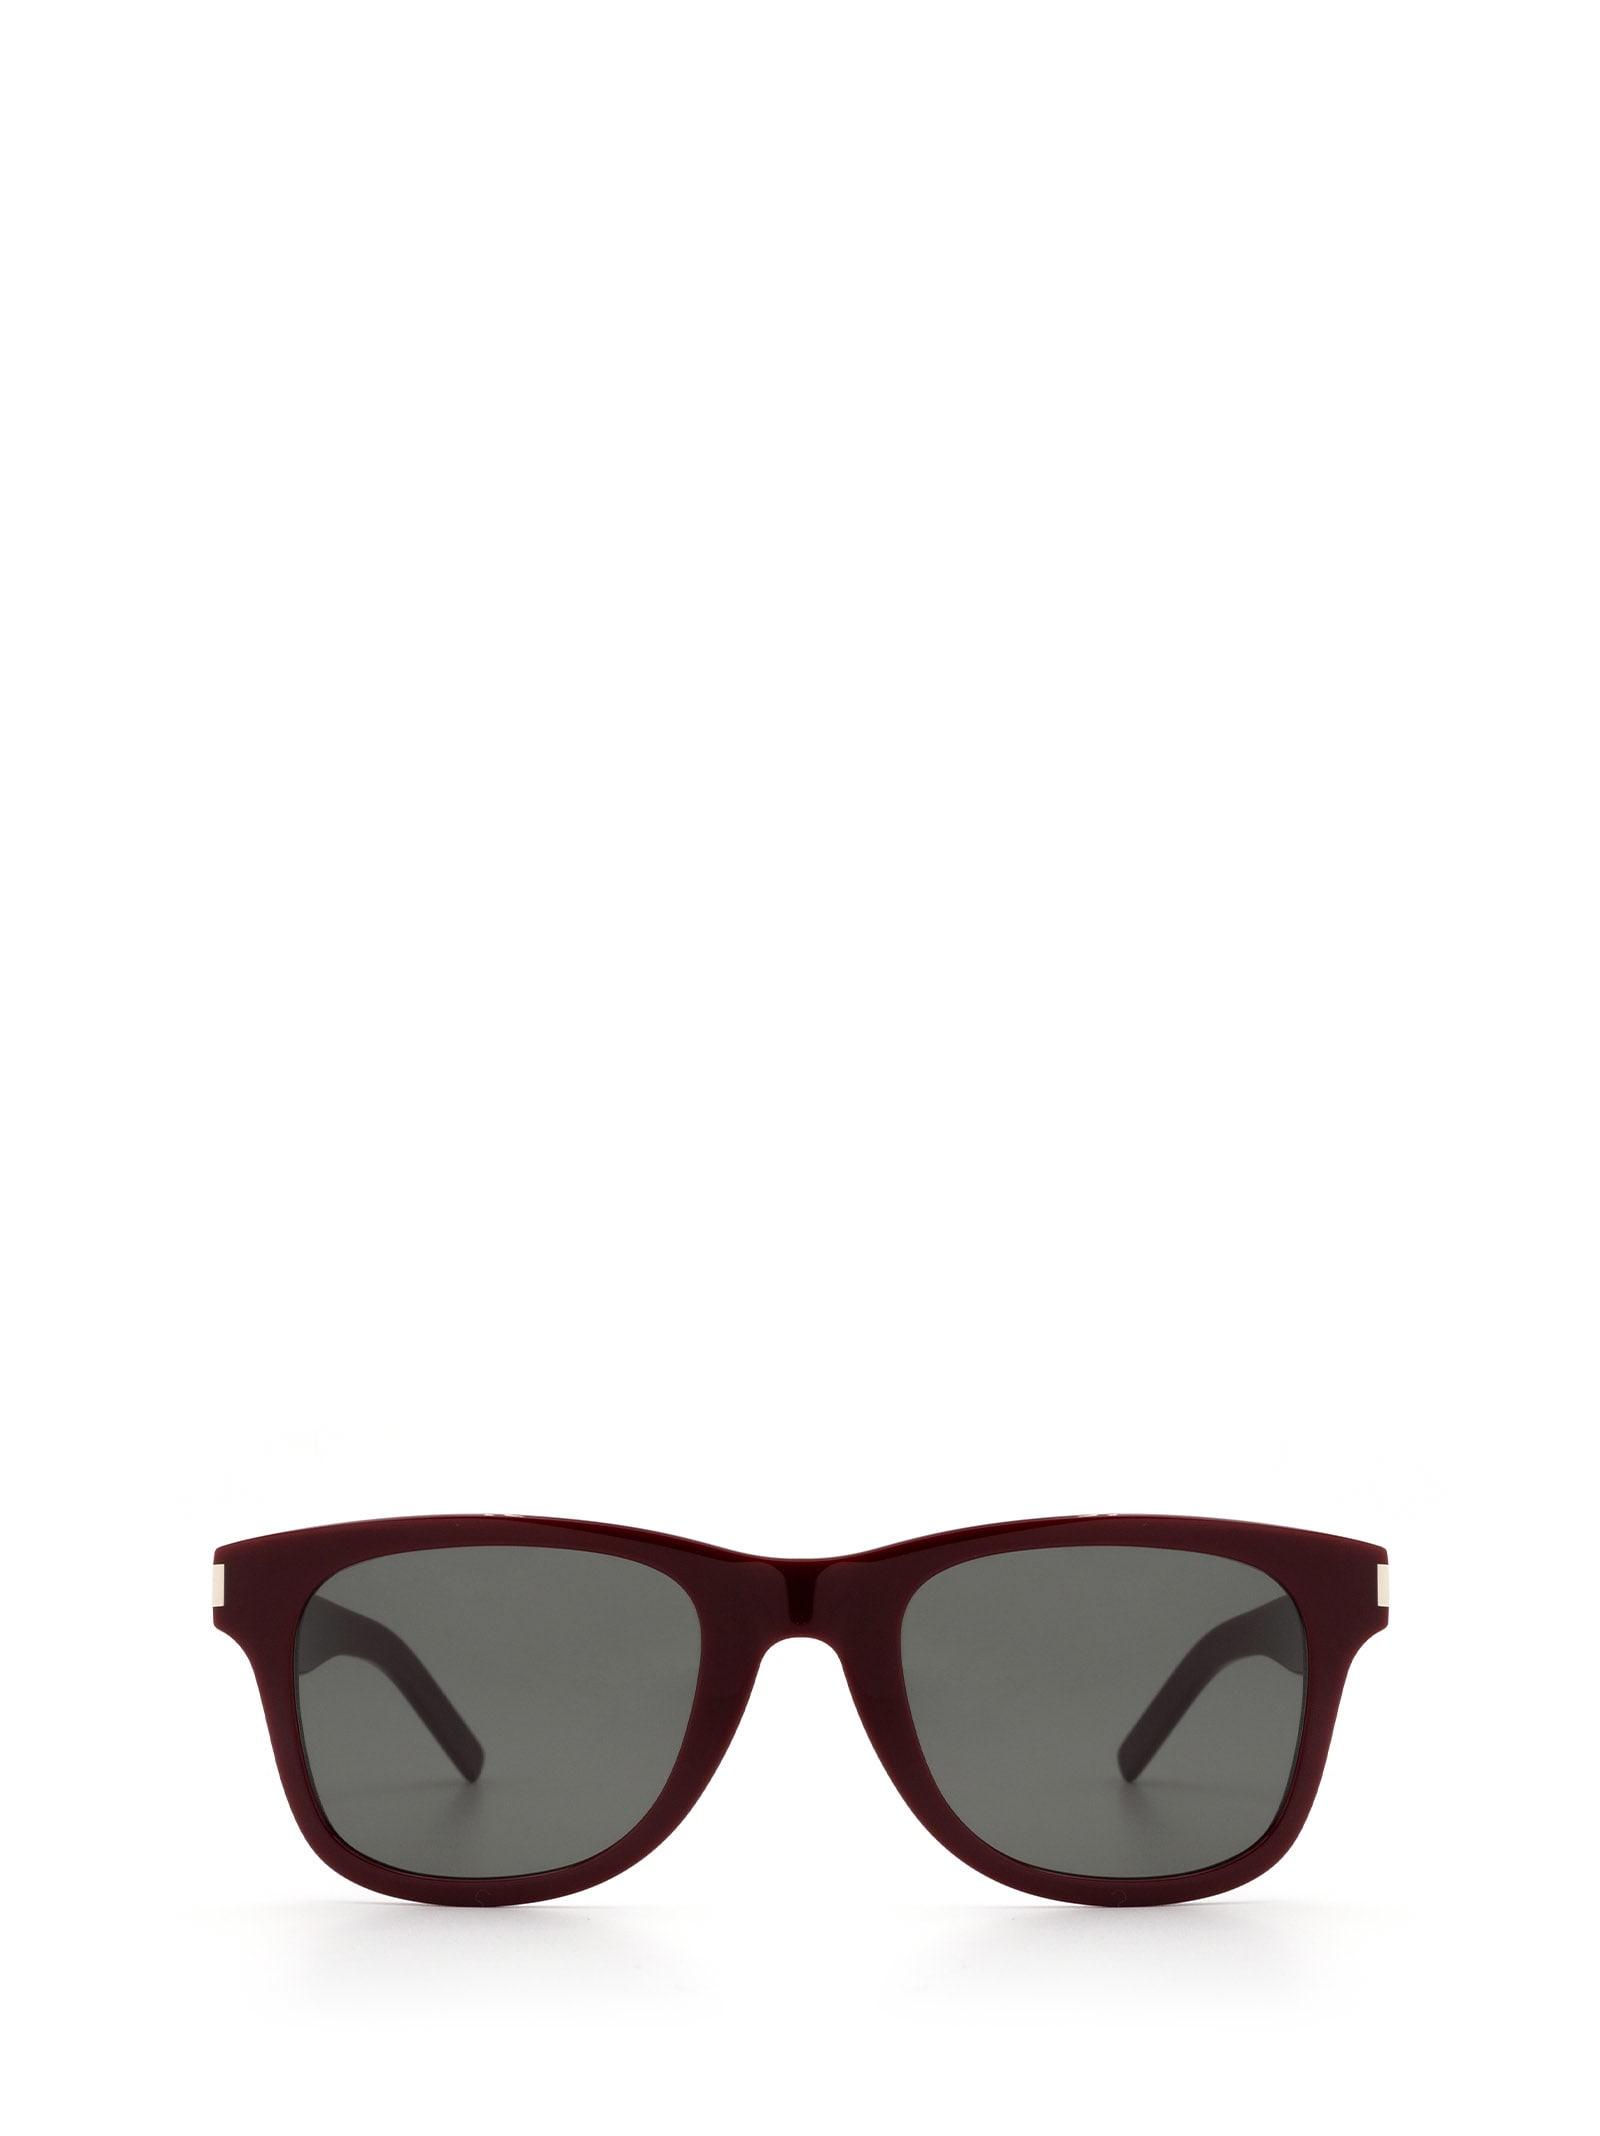 Saint Laurent Saint Laurent Sl51-bslim 004 Sunglasses